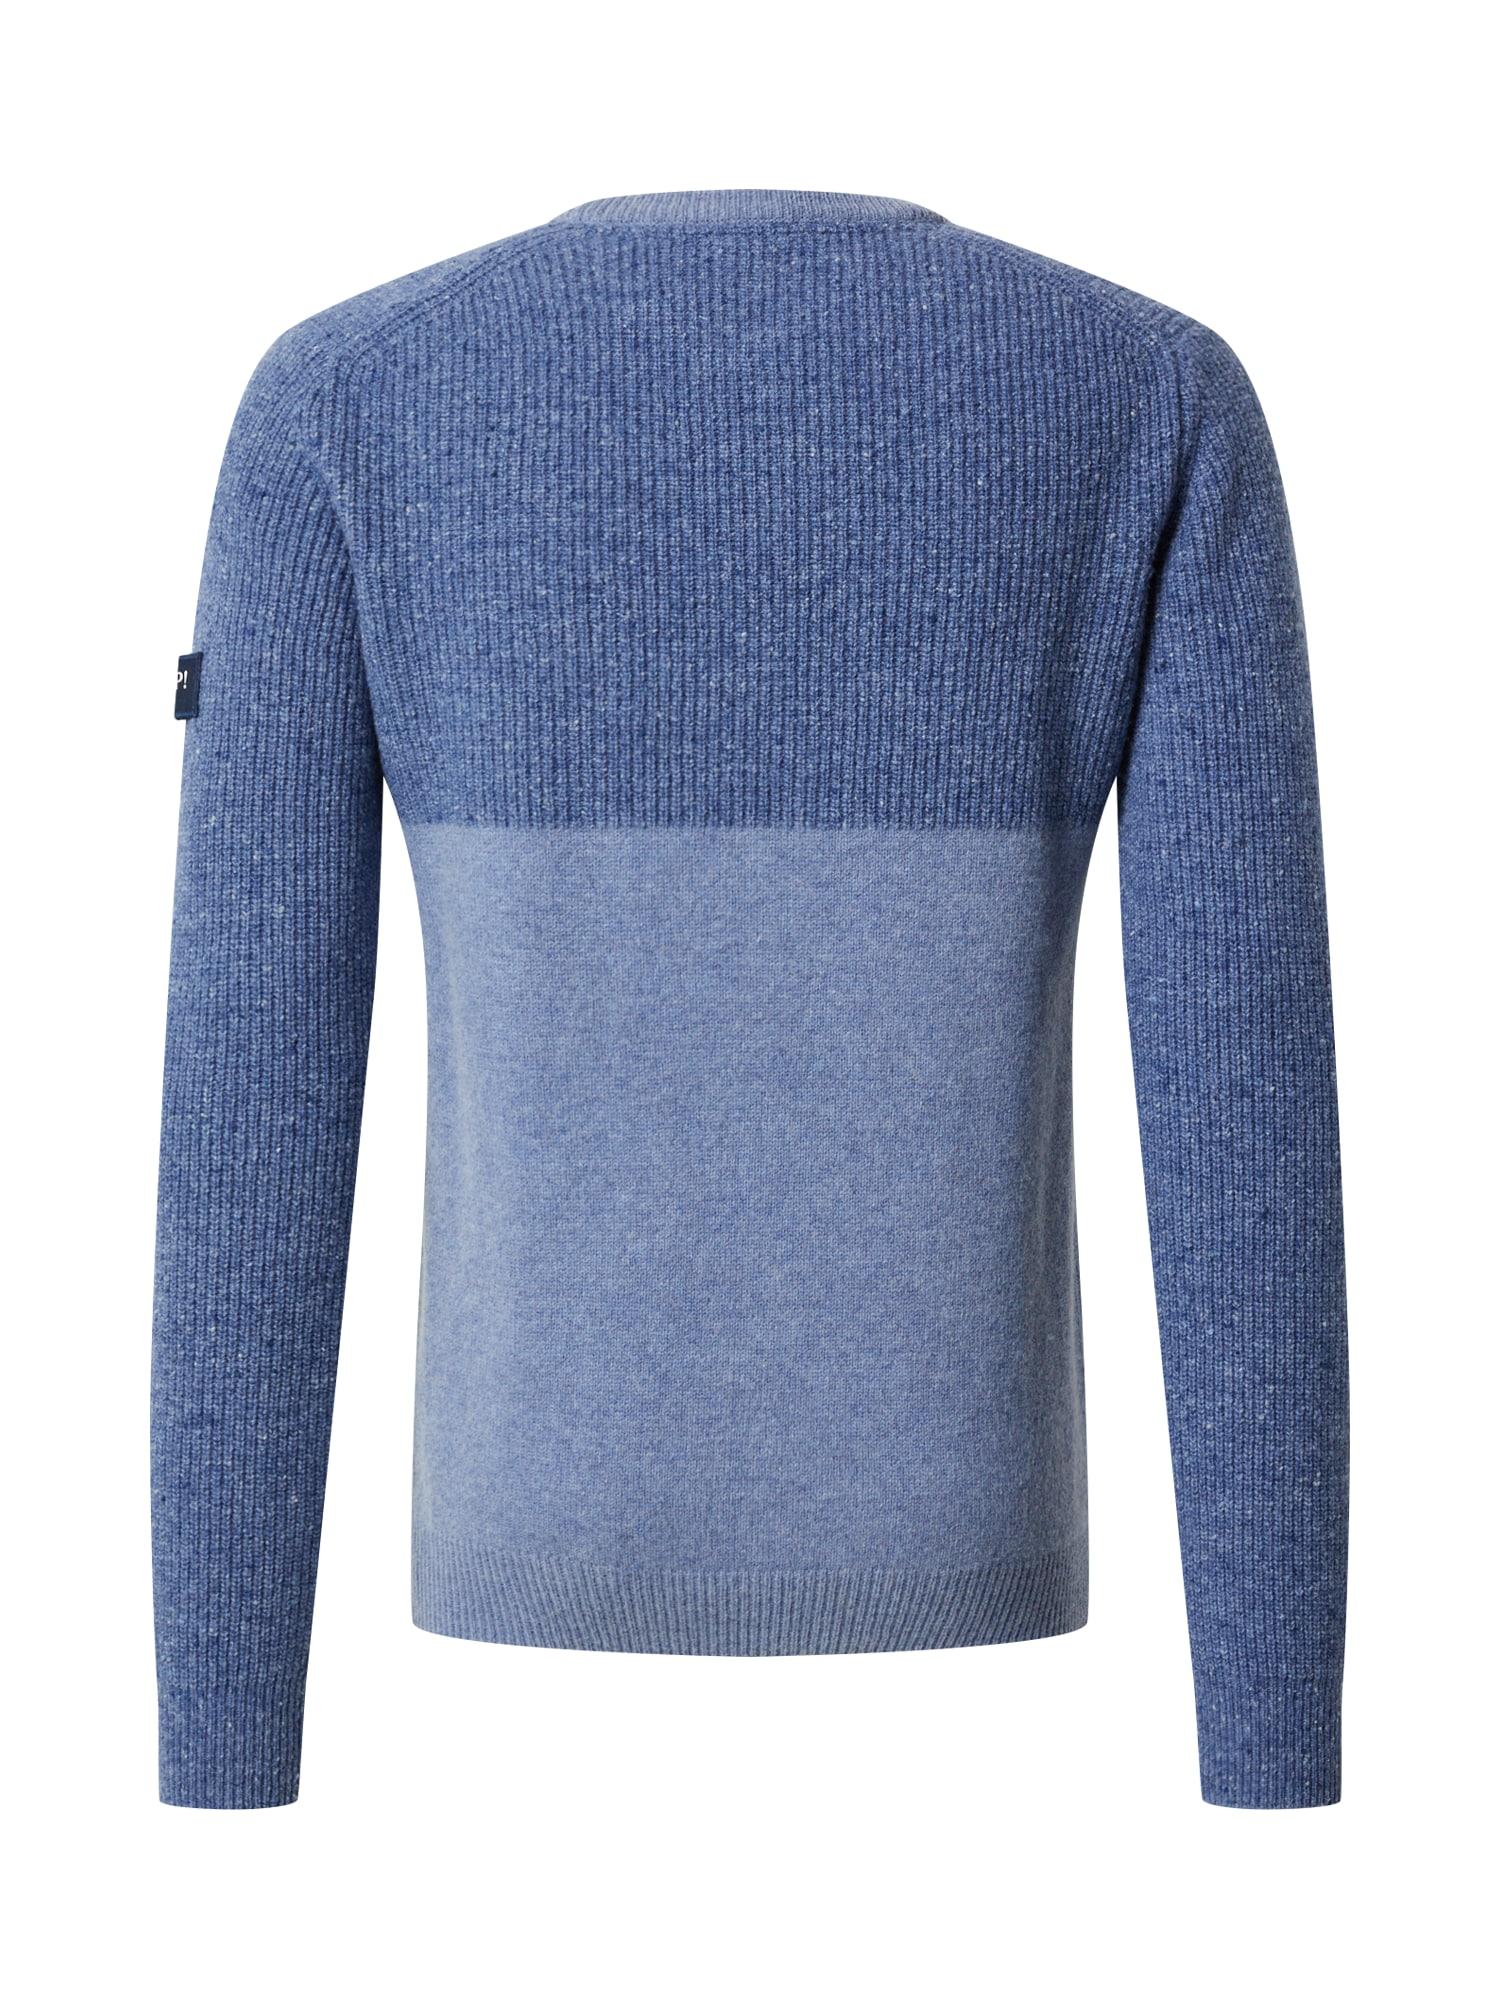 JOOP! Jeans Tröja 'Sassan'  duvblå / rökblå